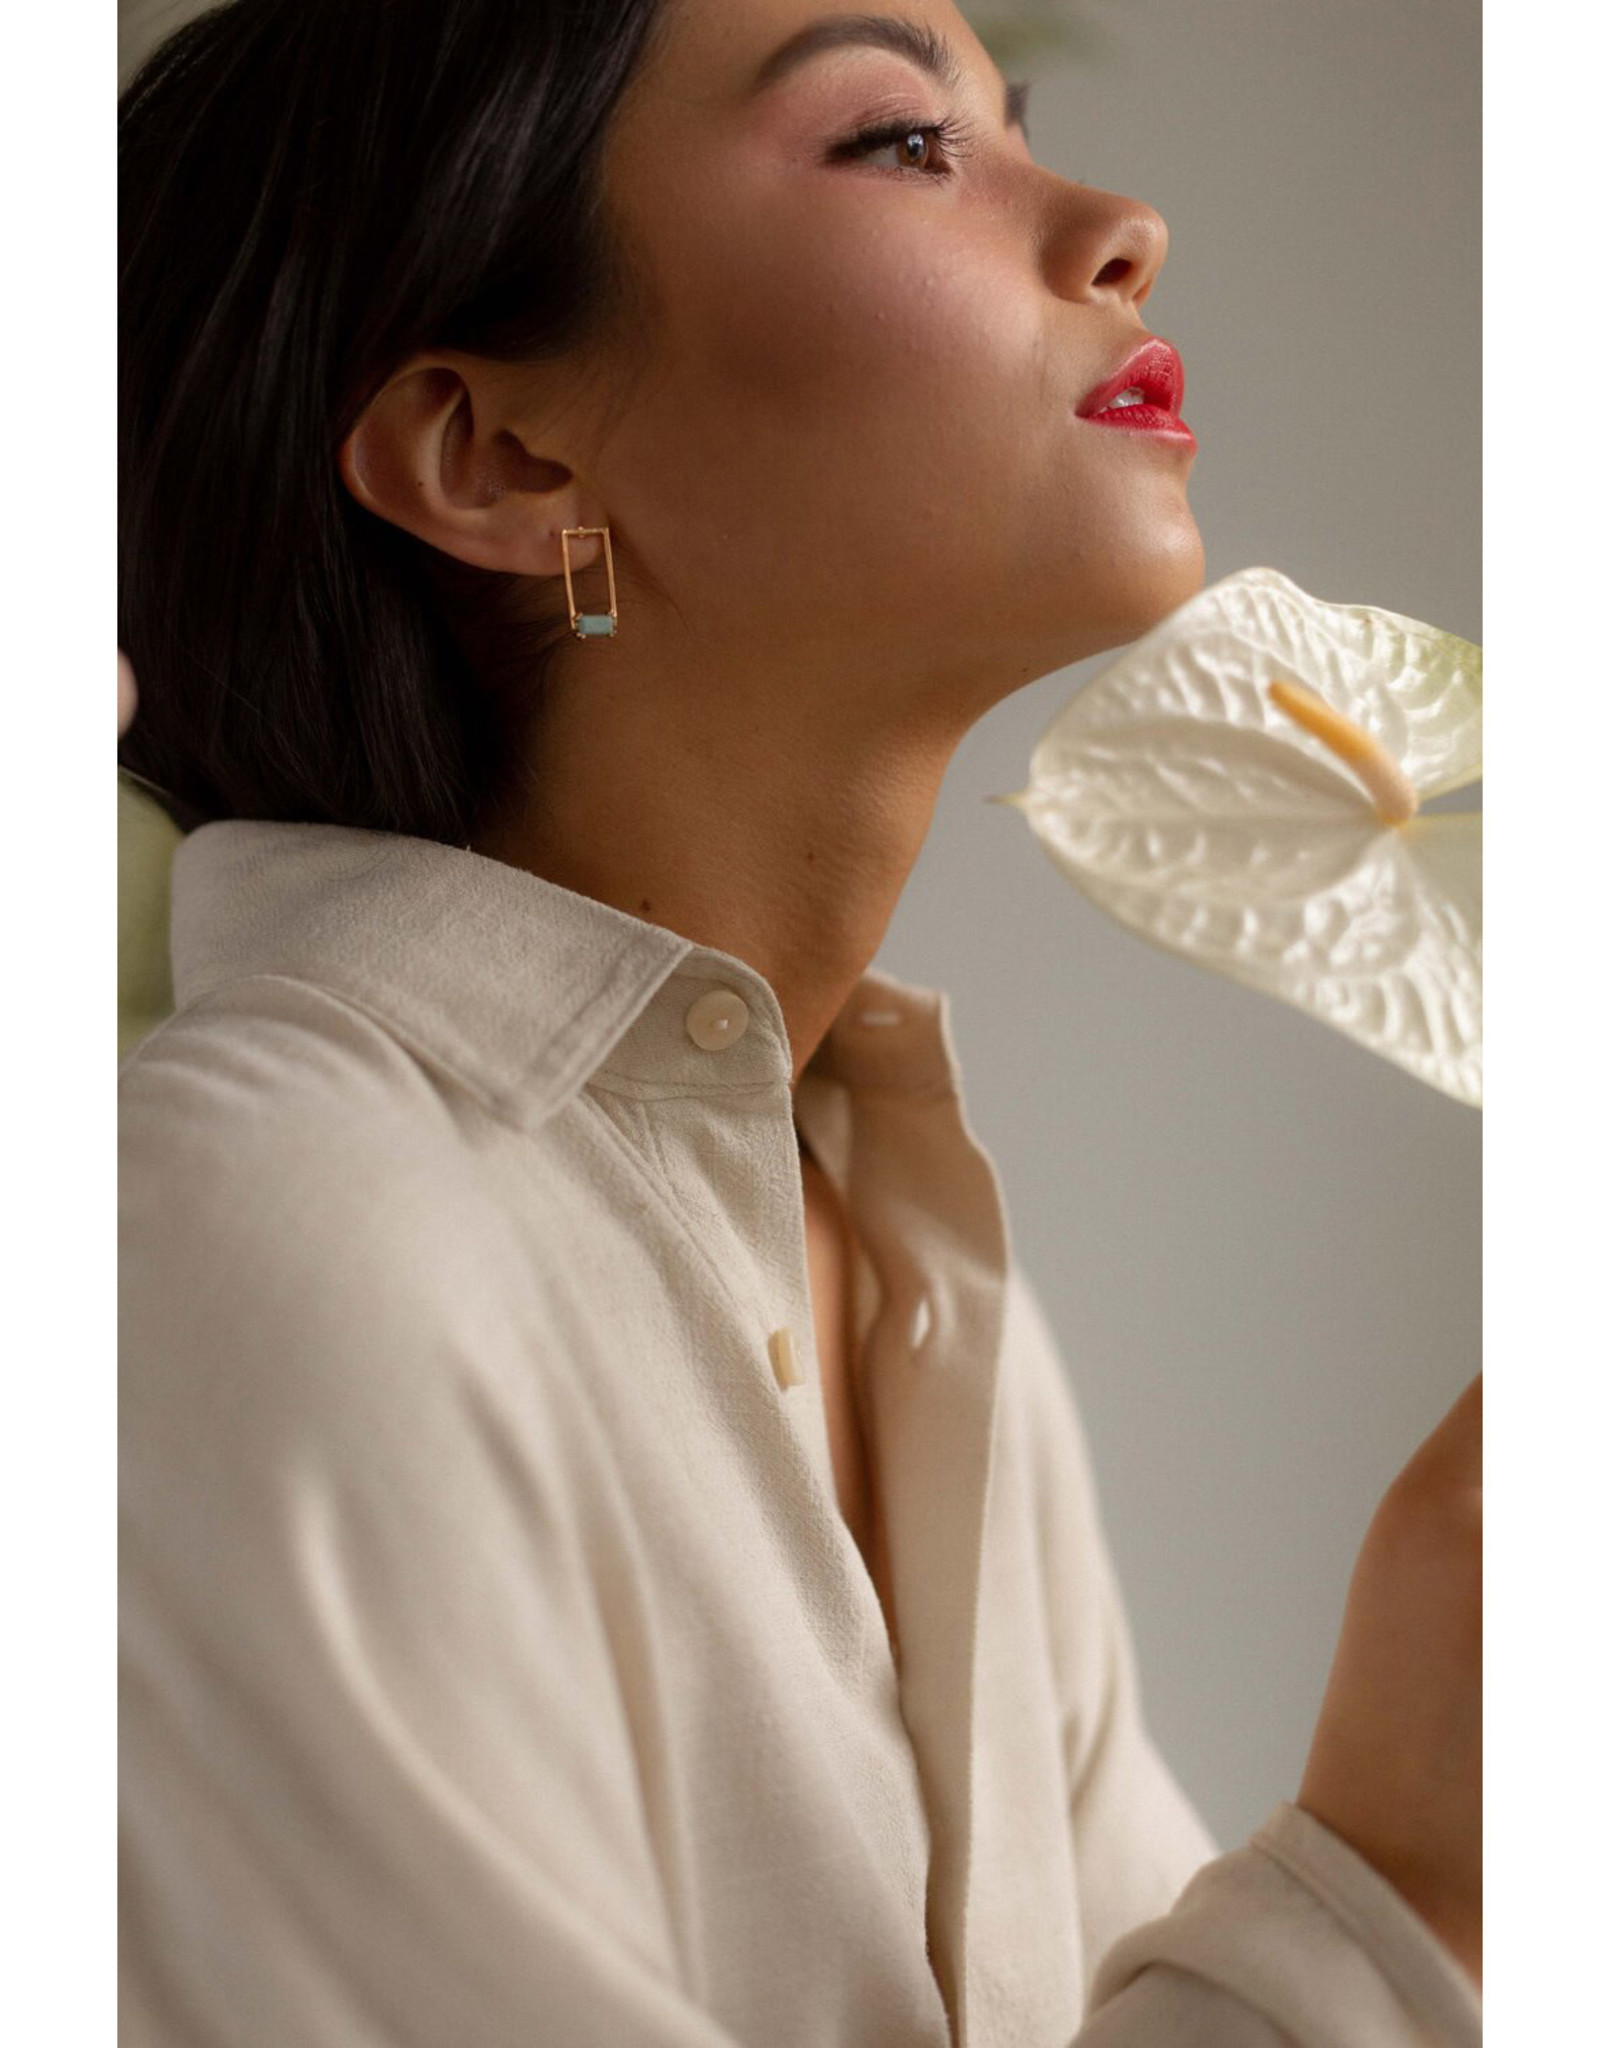 Hailey Gerrits Designs Corsica Earrings - Sunstone